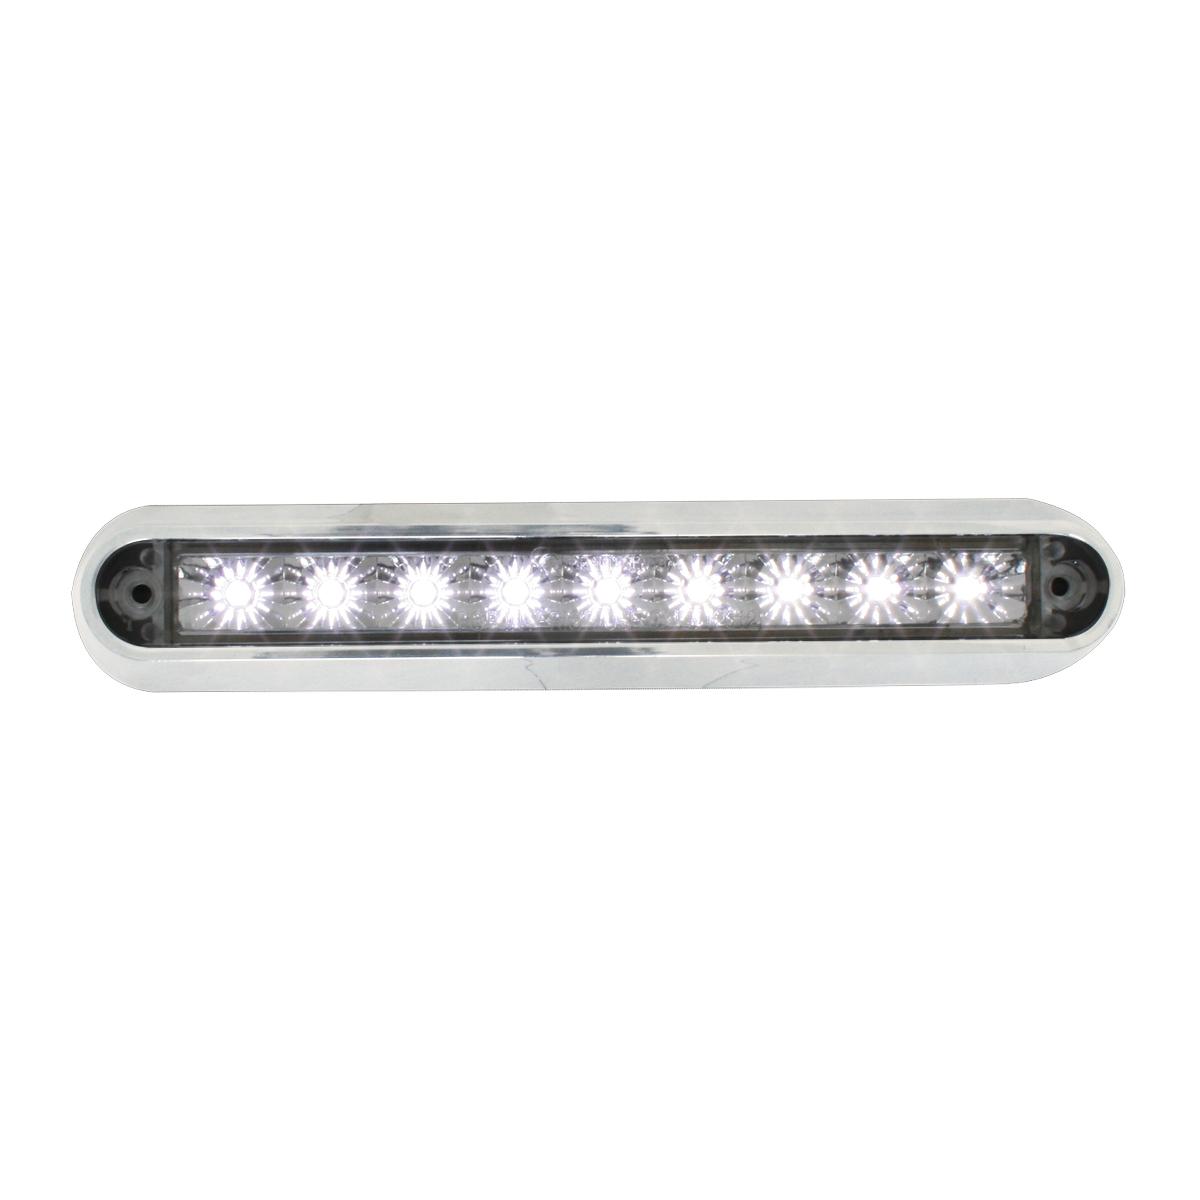 "76094 6.5"" Surface Mount LED Light Bar w/ Chrome Plastic Base"